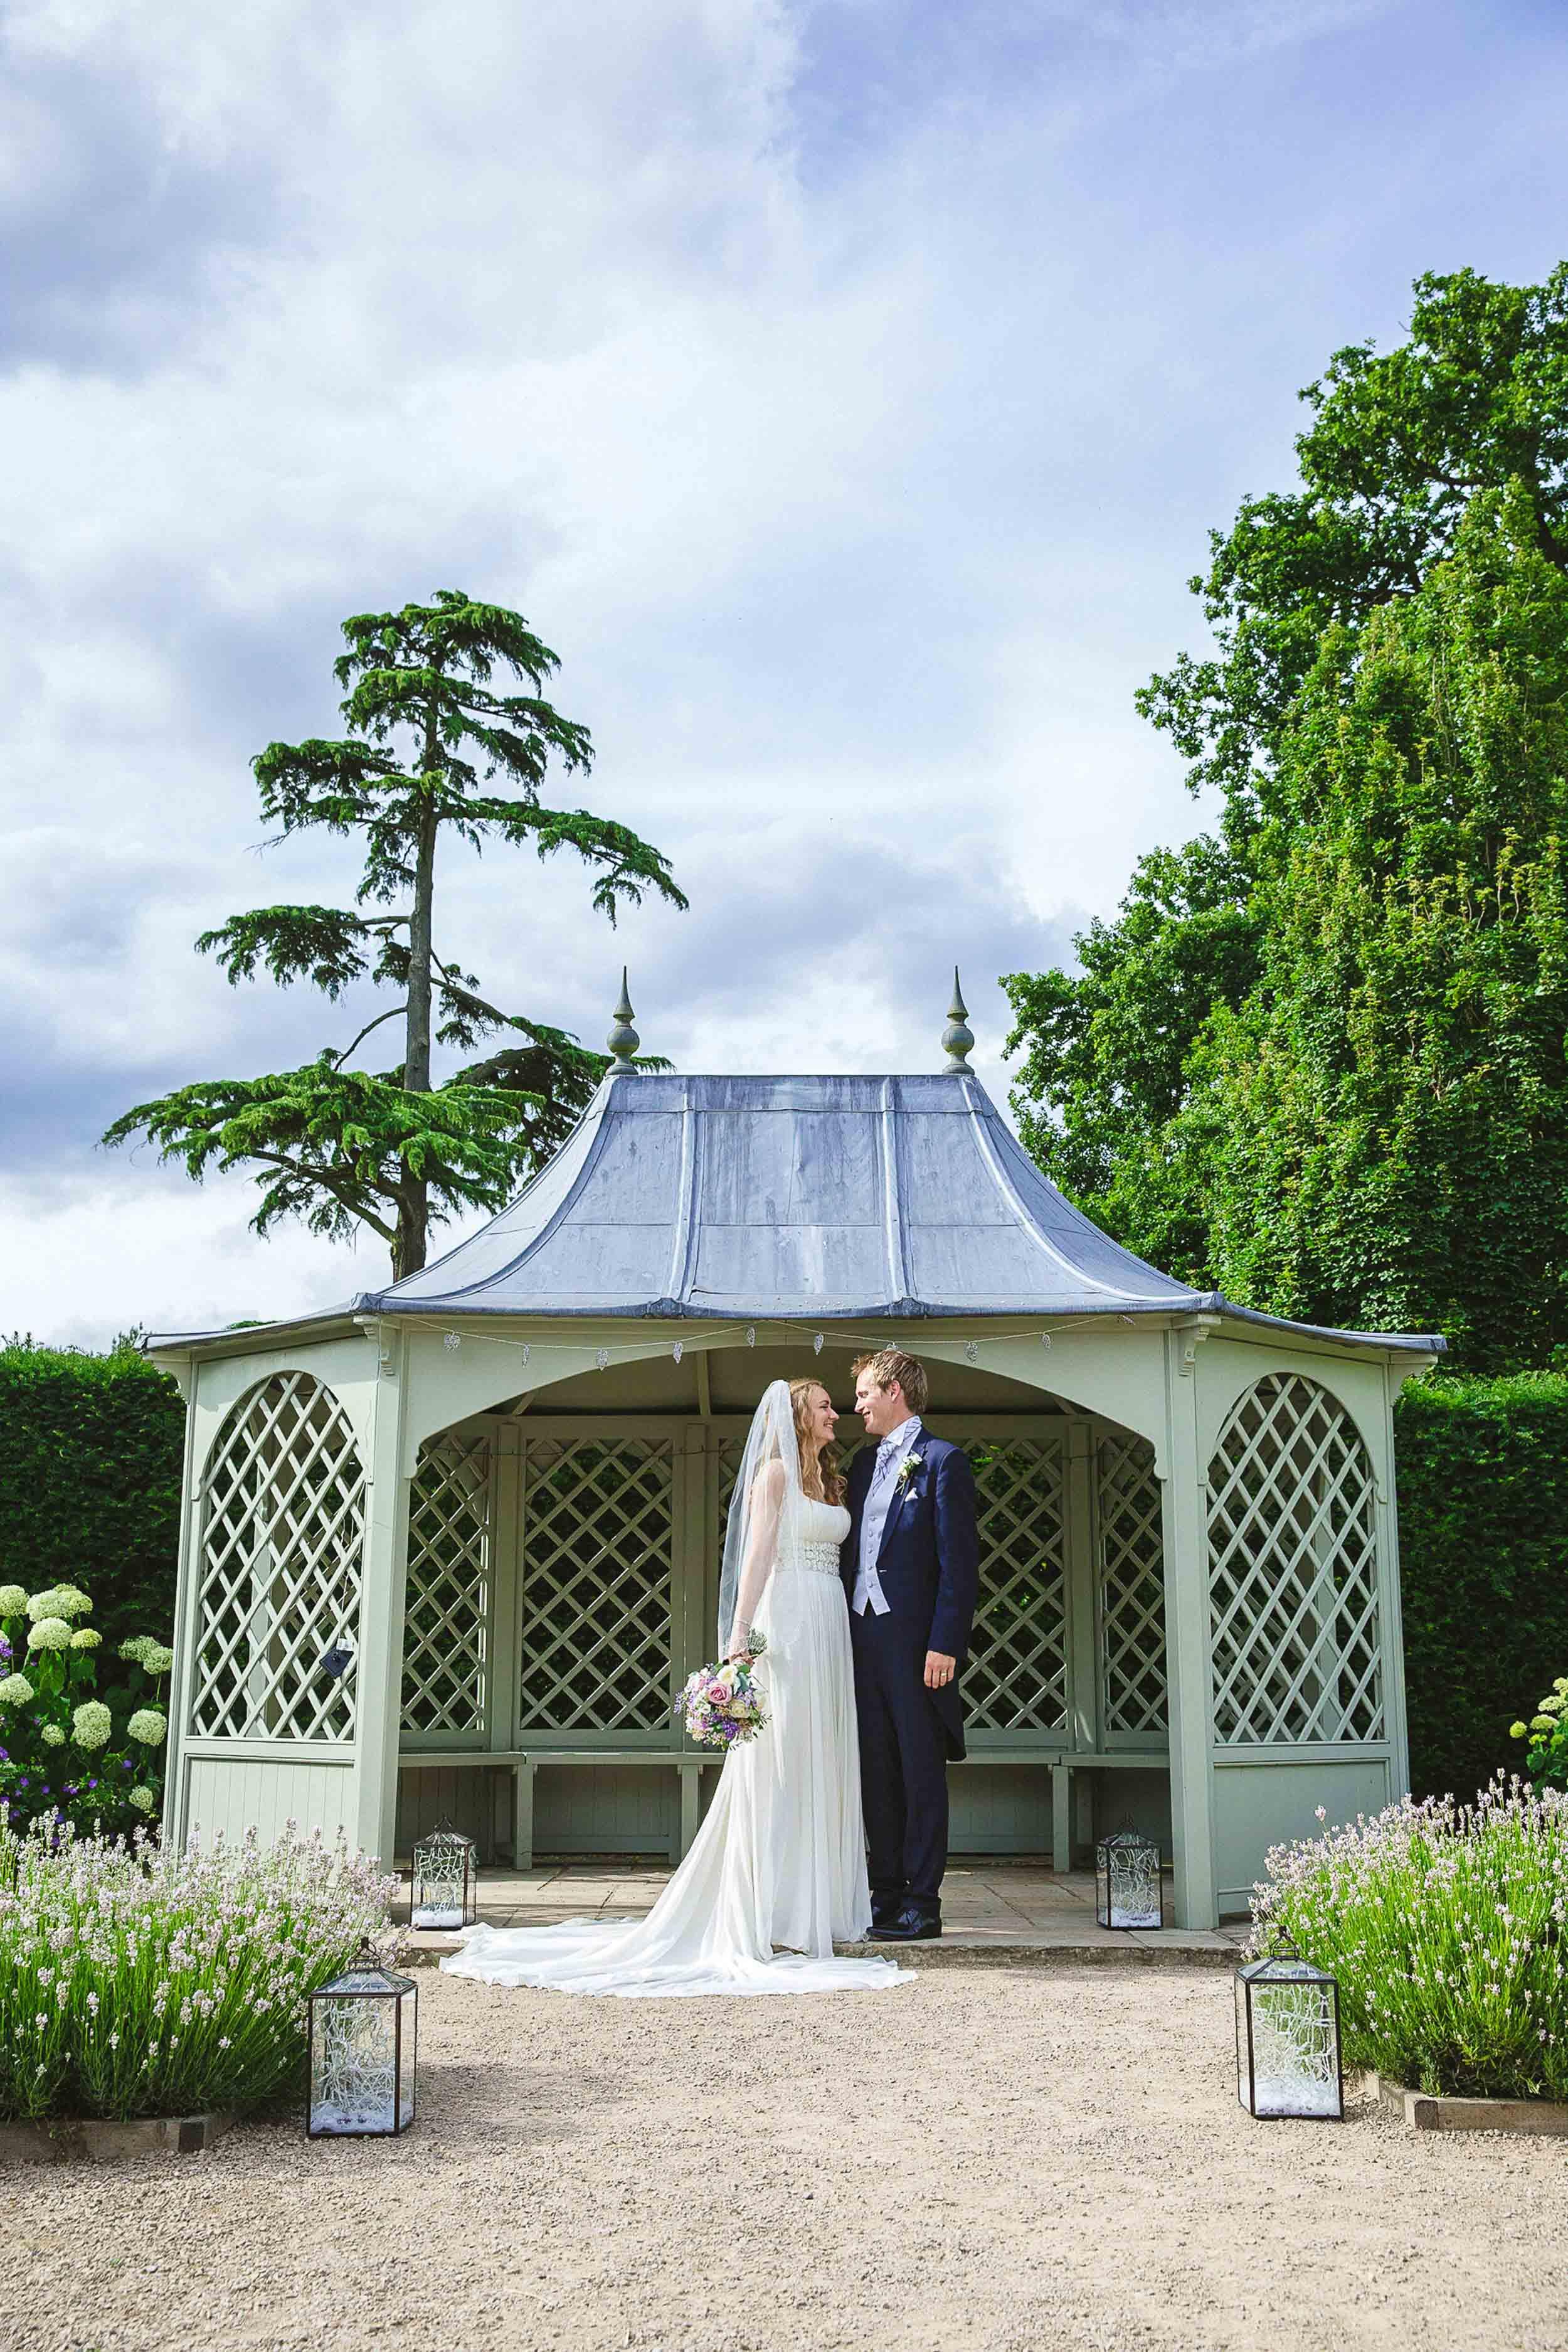 Marks-Hall-Wedding-Photographer-44.jpg